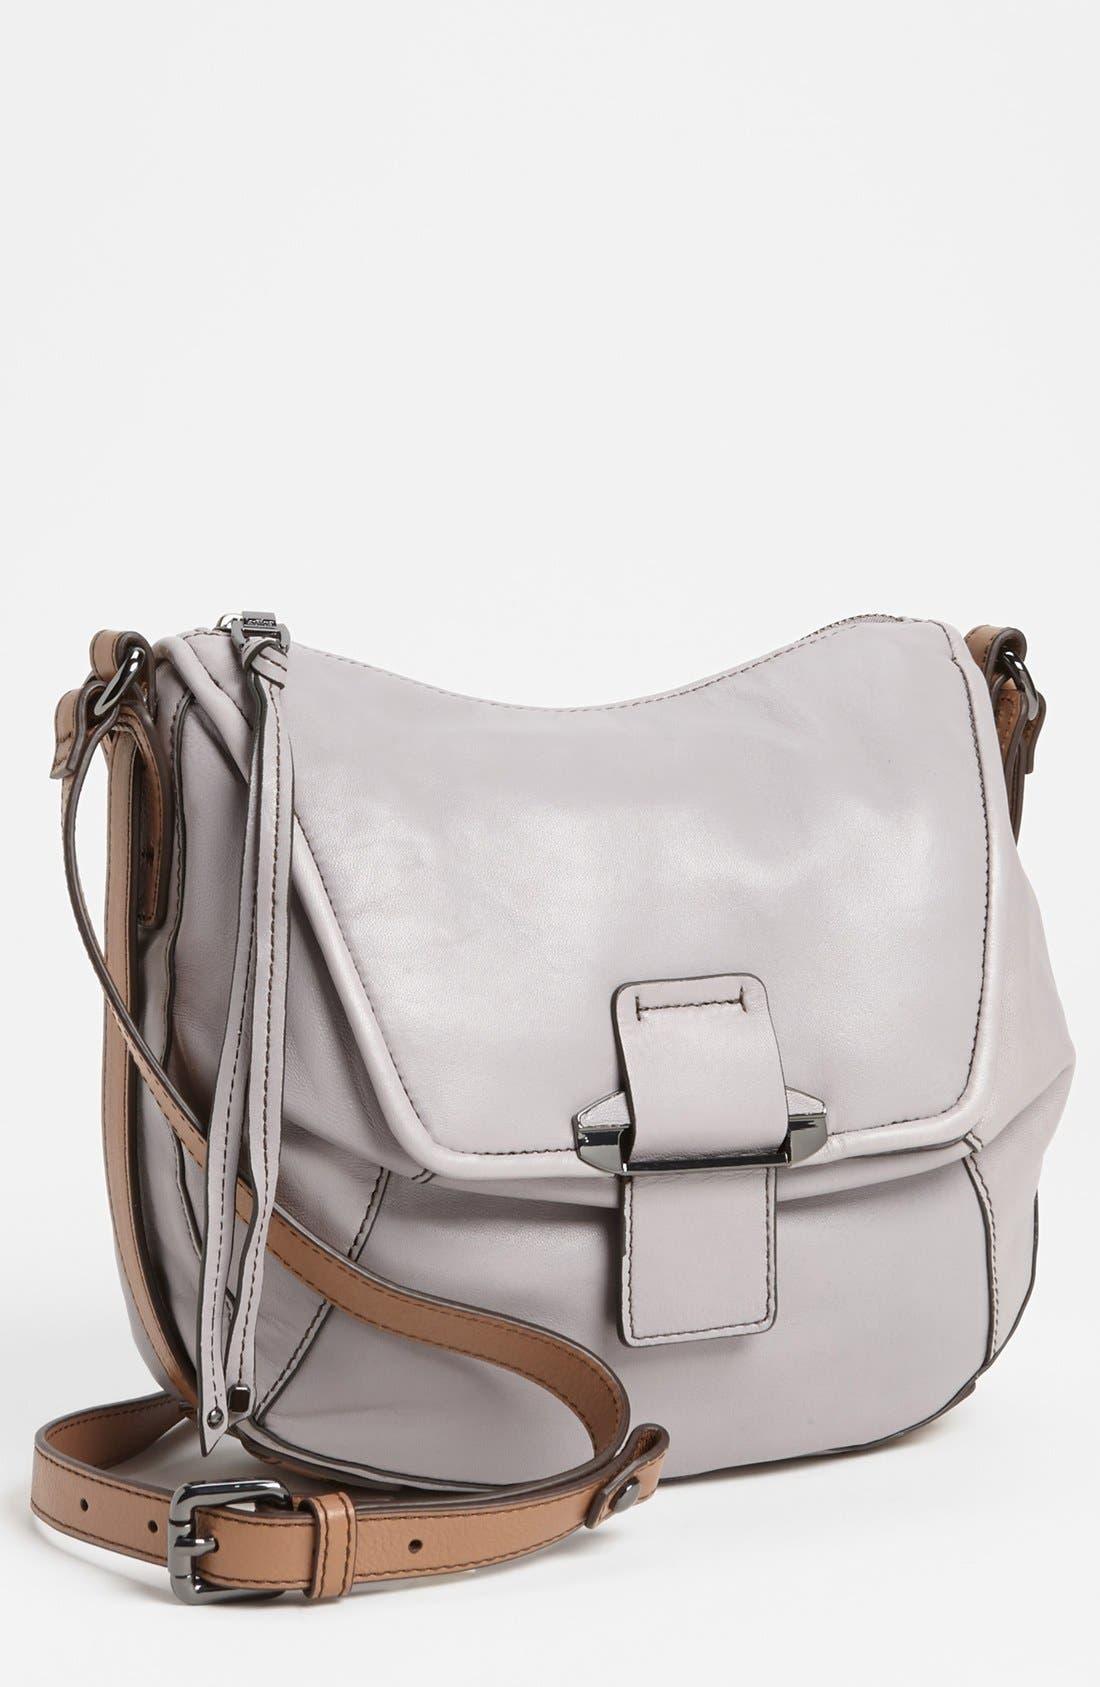 Alternate Image 1 Selected - Kooba 'Gary' Crossbody Bag